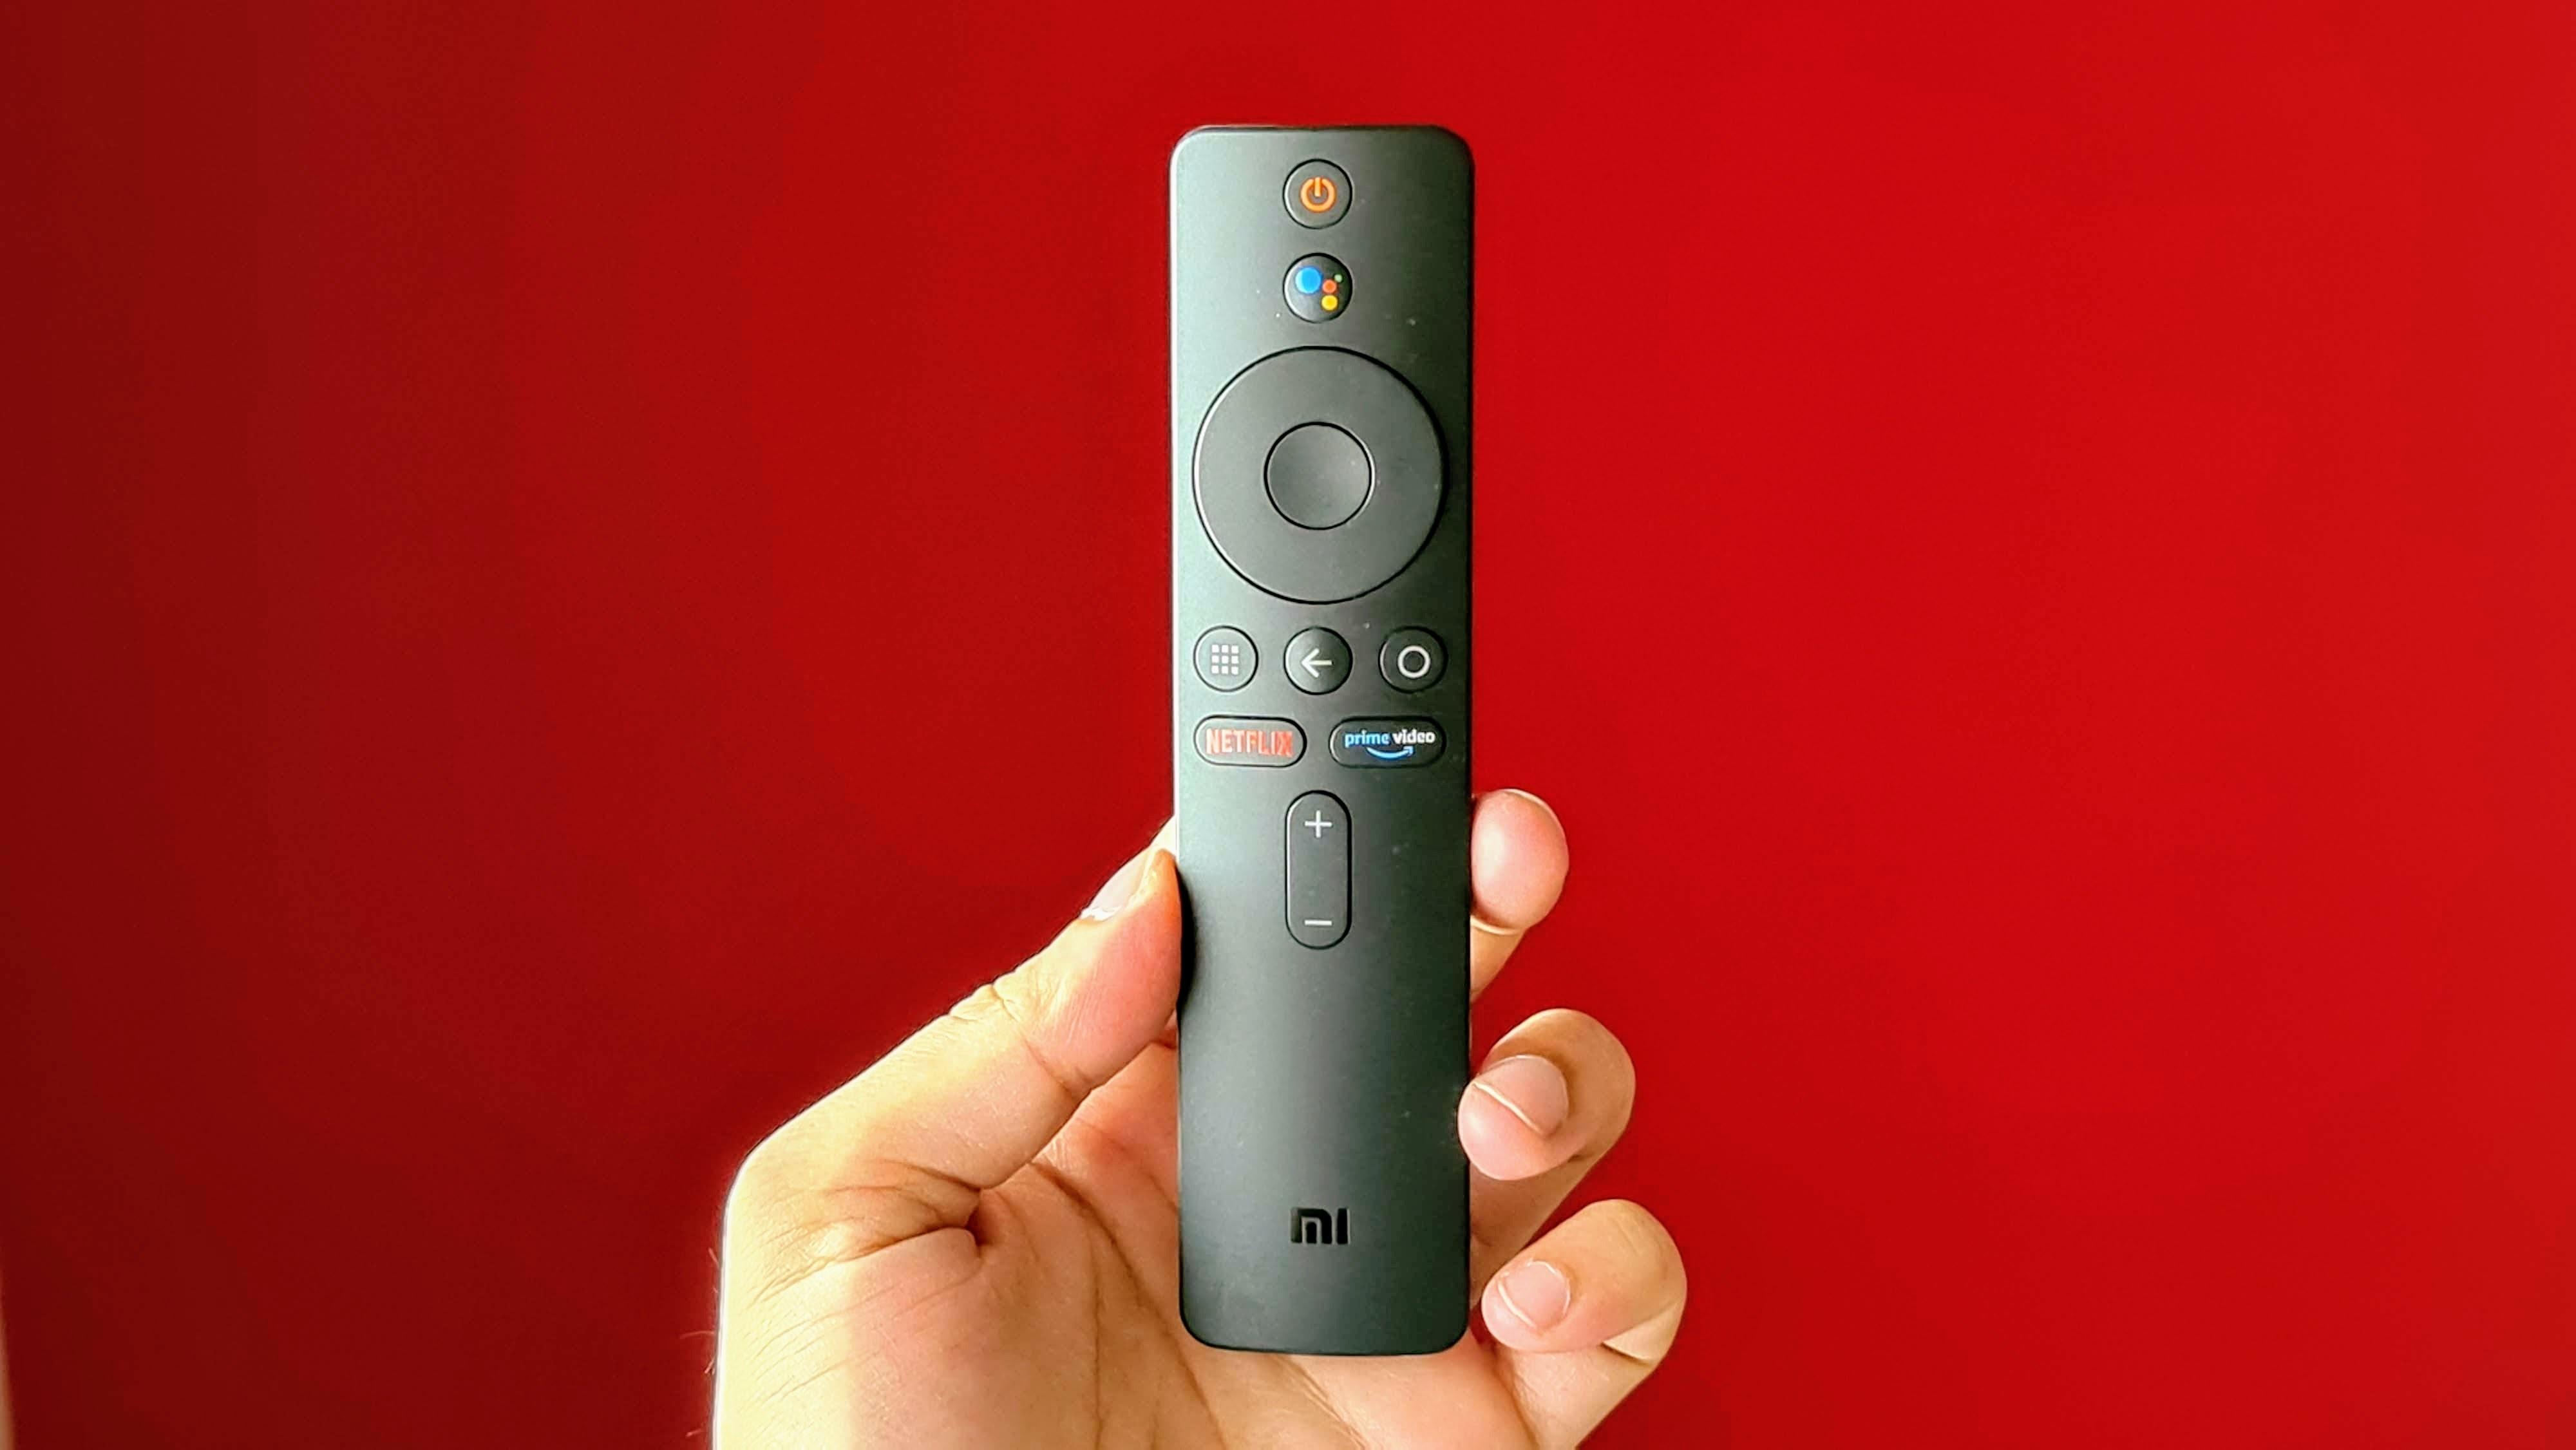 Xiaomi Mi Box 4K IR remote.